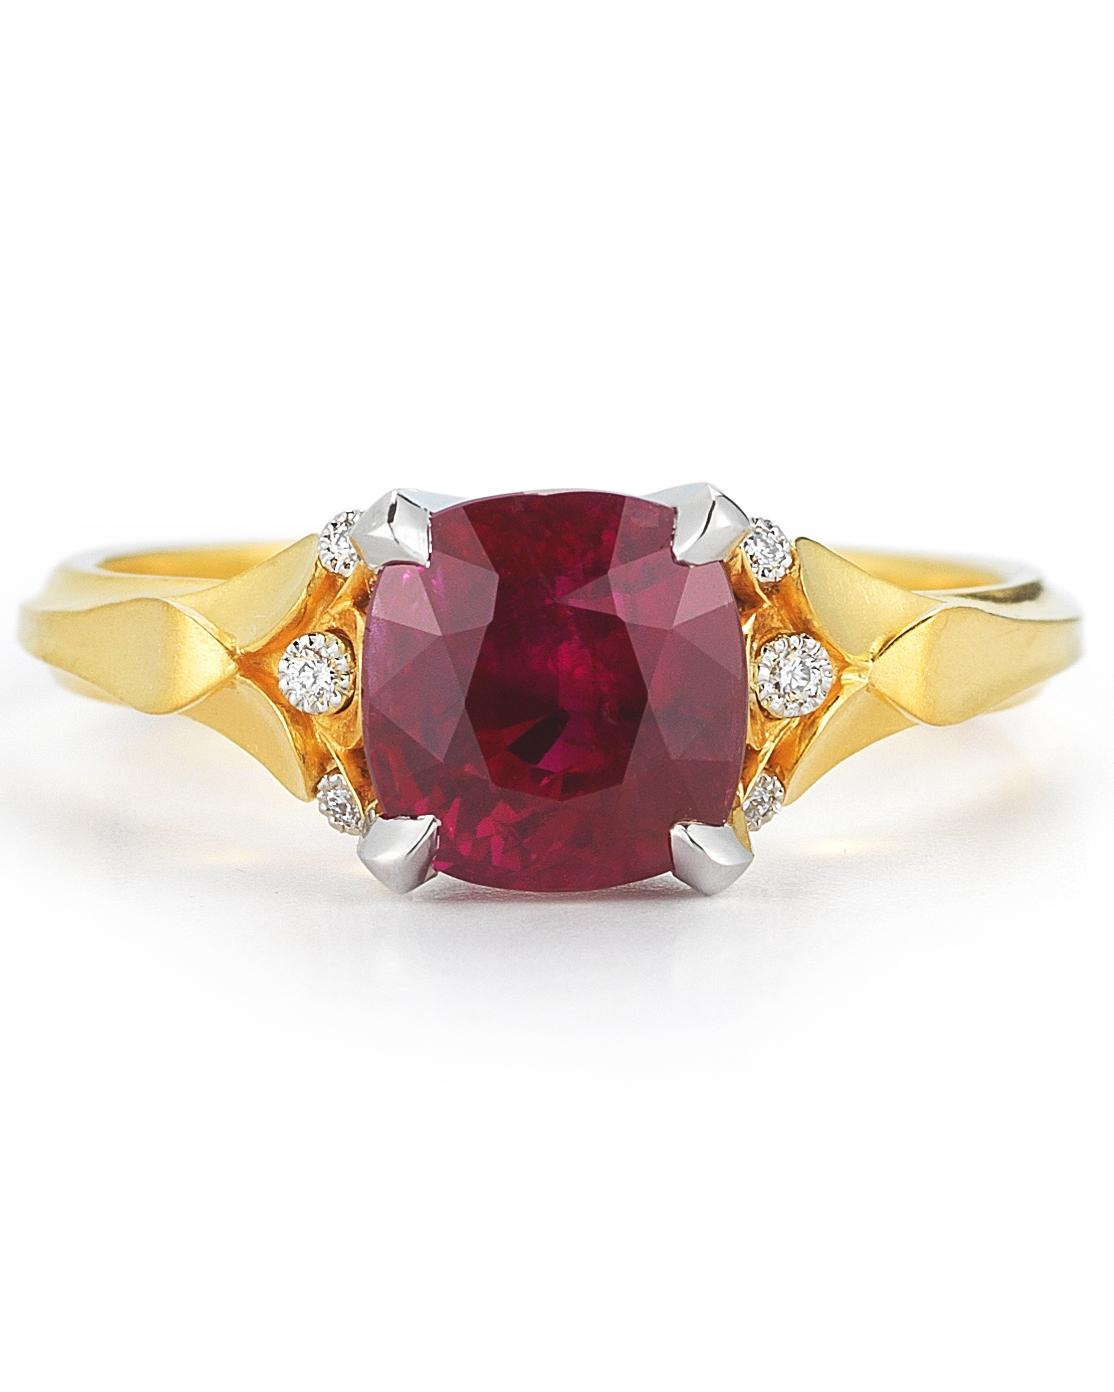 mcteigue-mcclelland-ruby-classic-flora-ring-diamonds-yellow-gold-0816.jpg